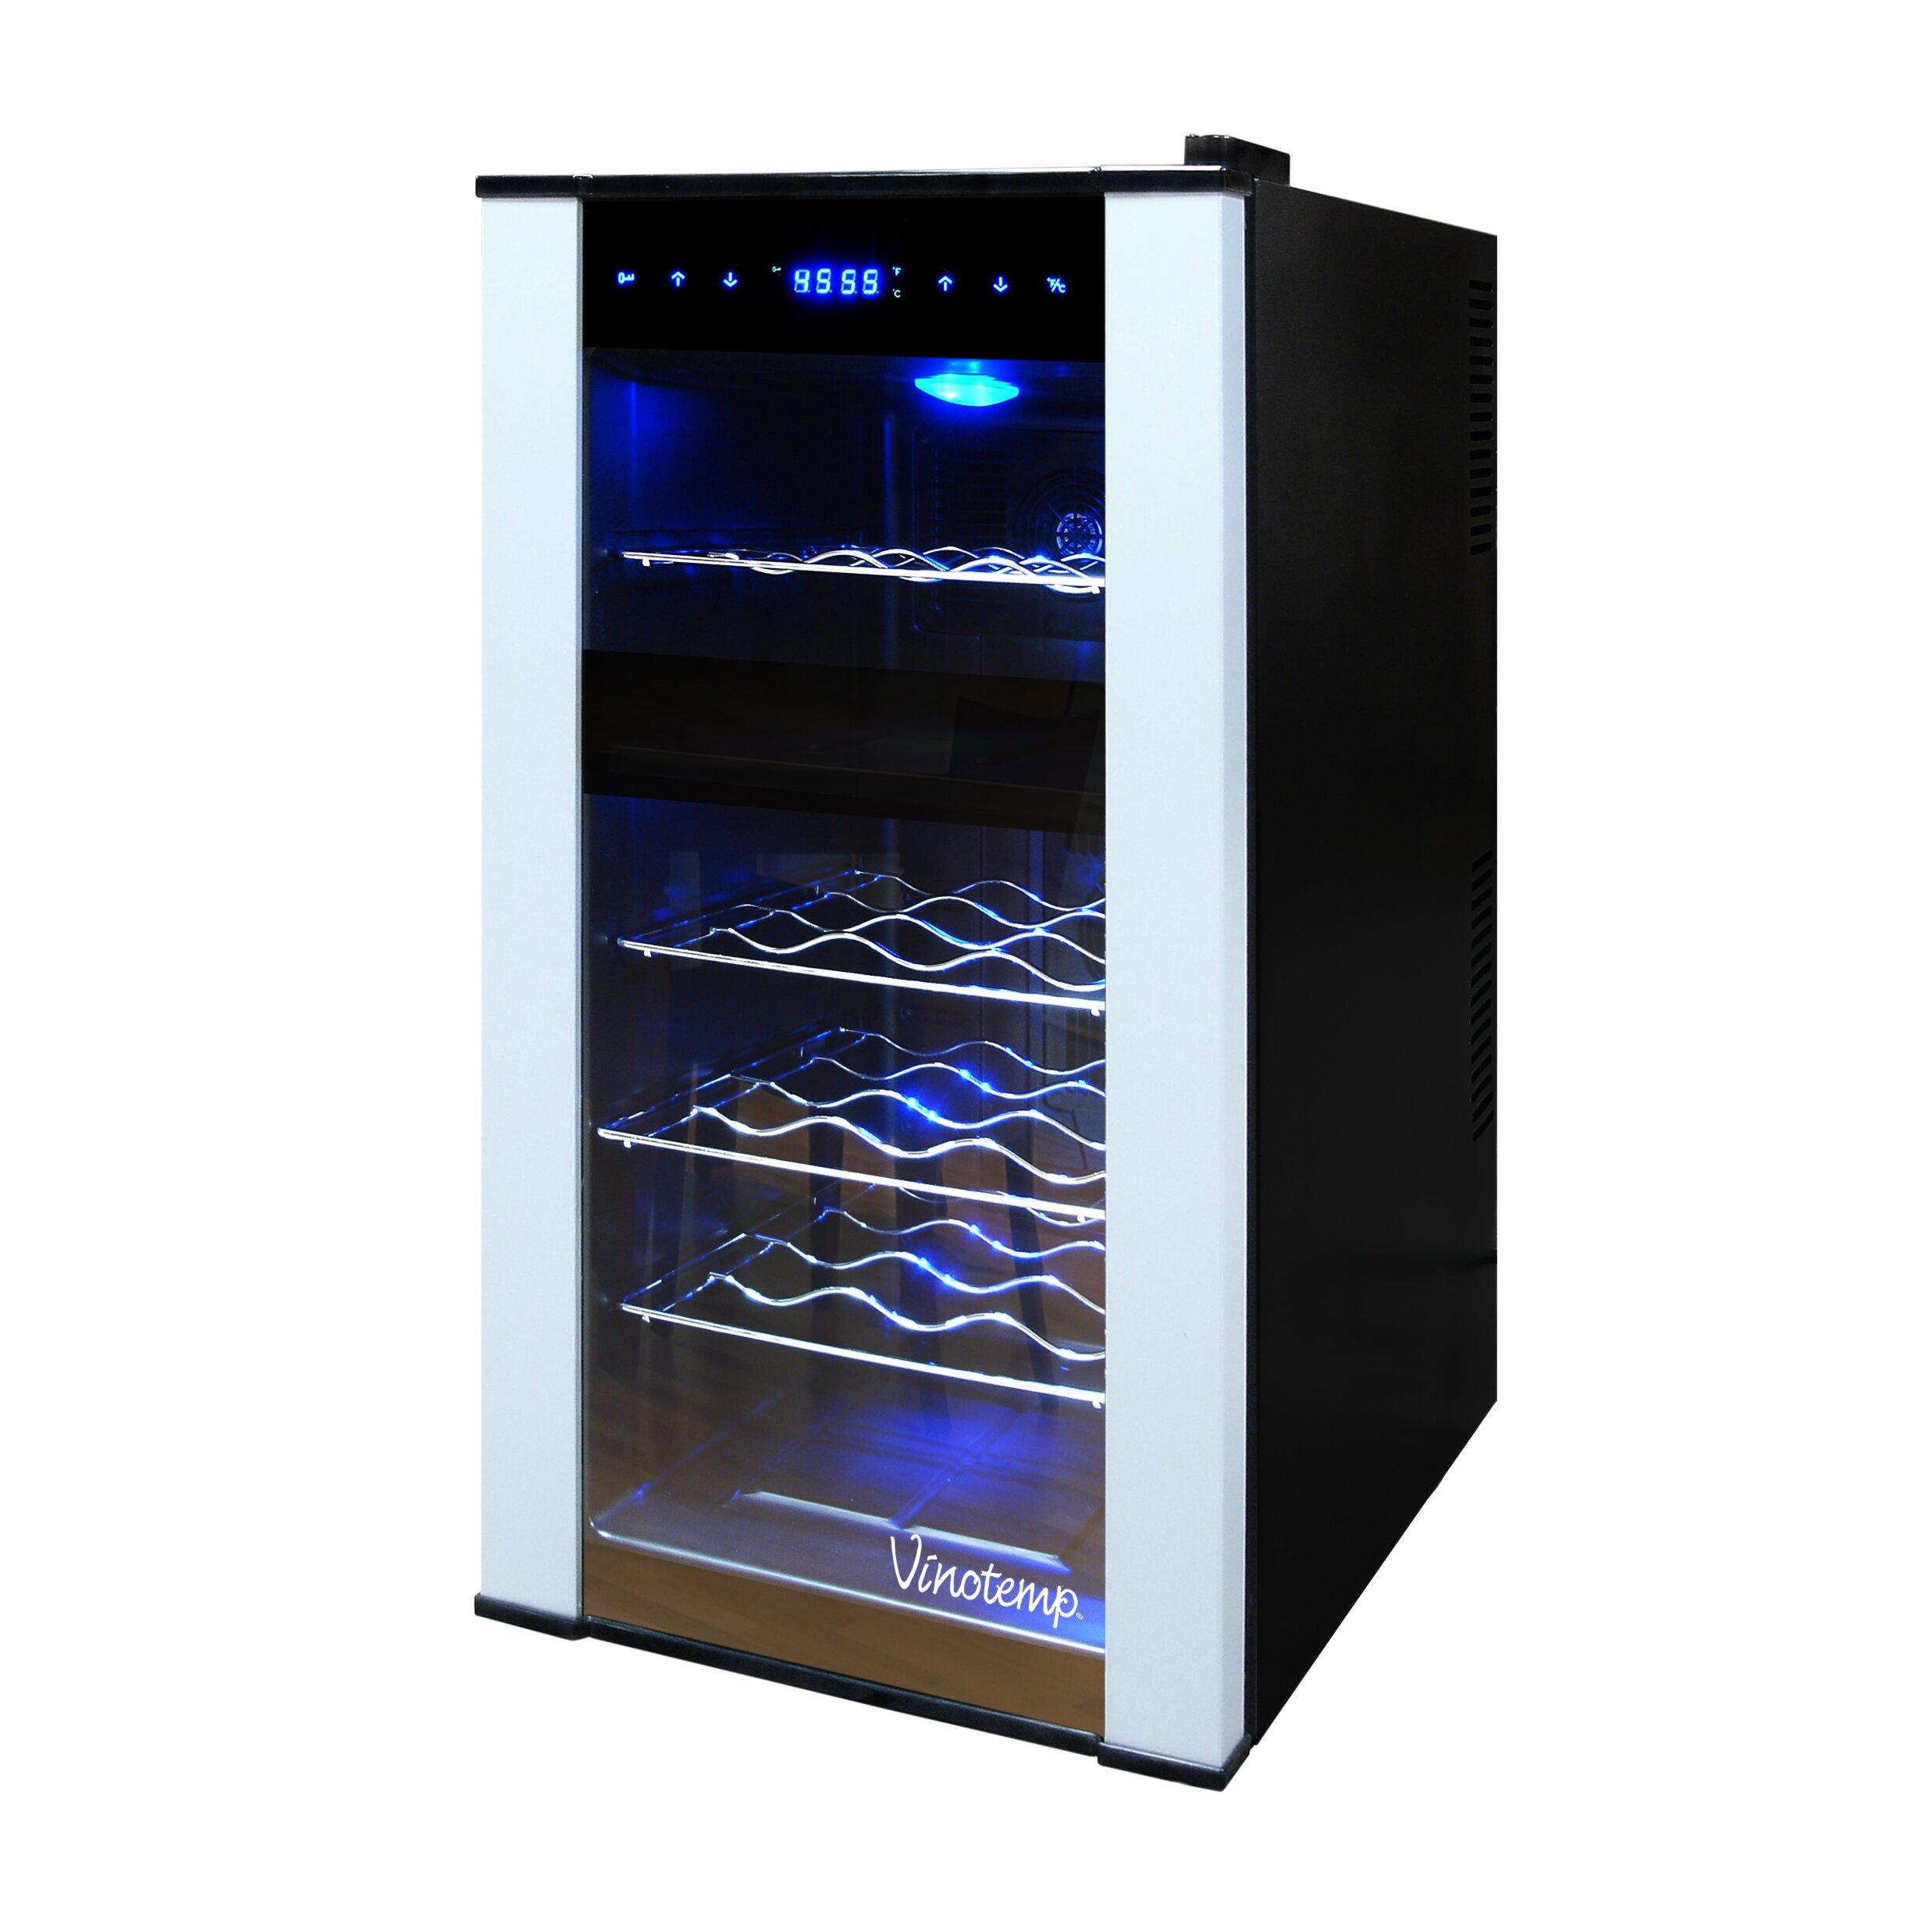 Cabinet With Wine Cooler Vinotemp 18 Bottle Dual Zone Freestanding Wine Refrigerator